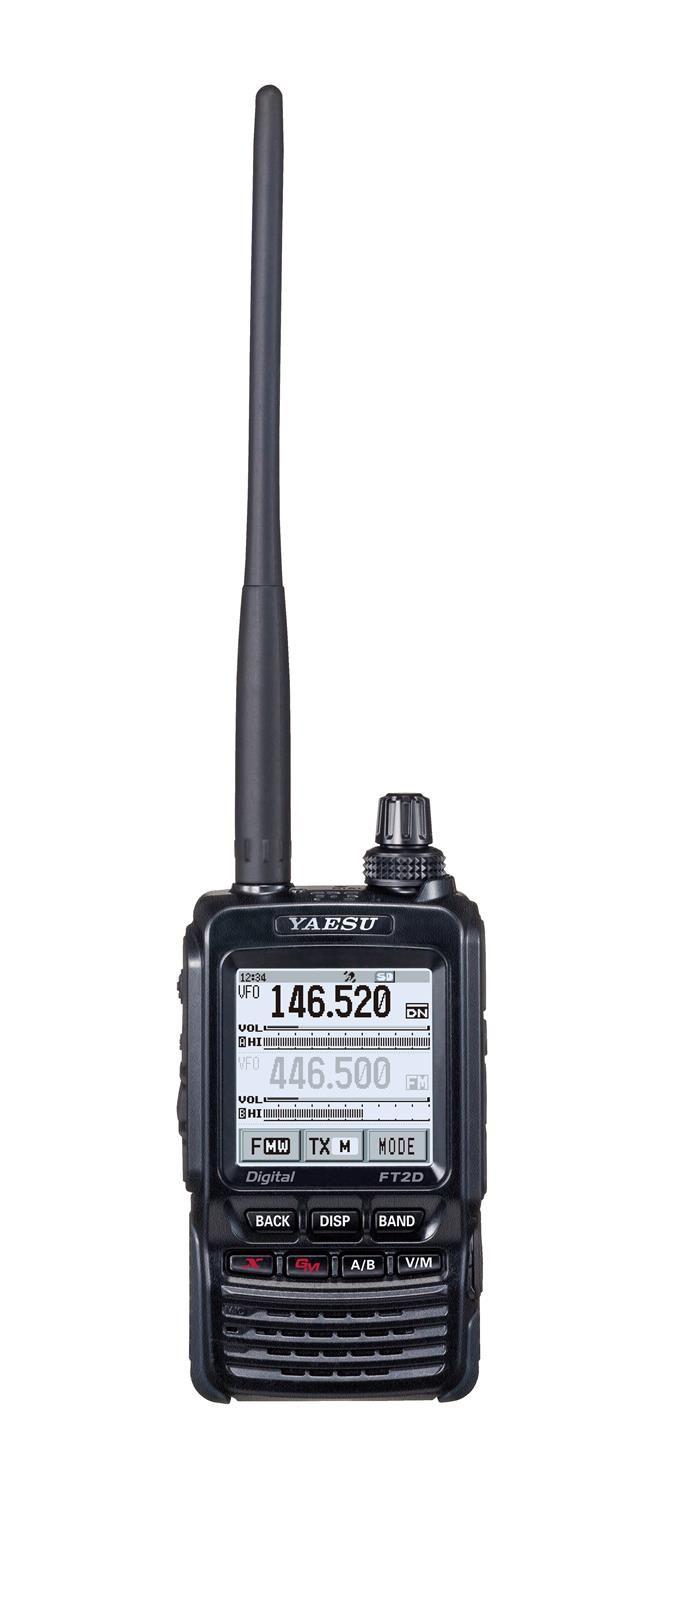 yaesu ft2dr 144430 mhz dual band c4fm digital hts are leading edge transceivers